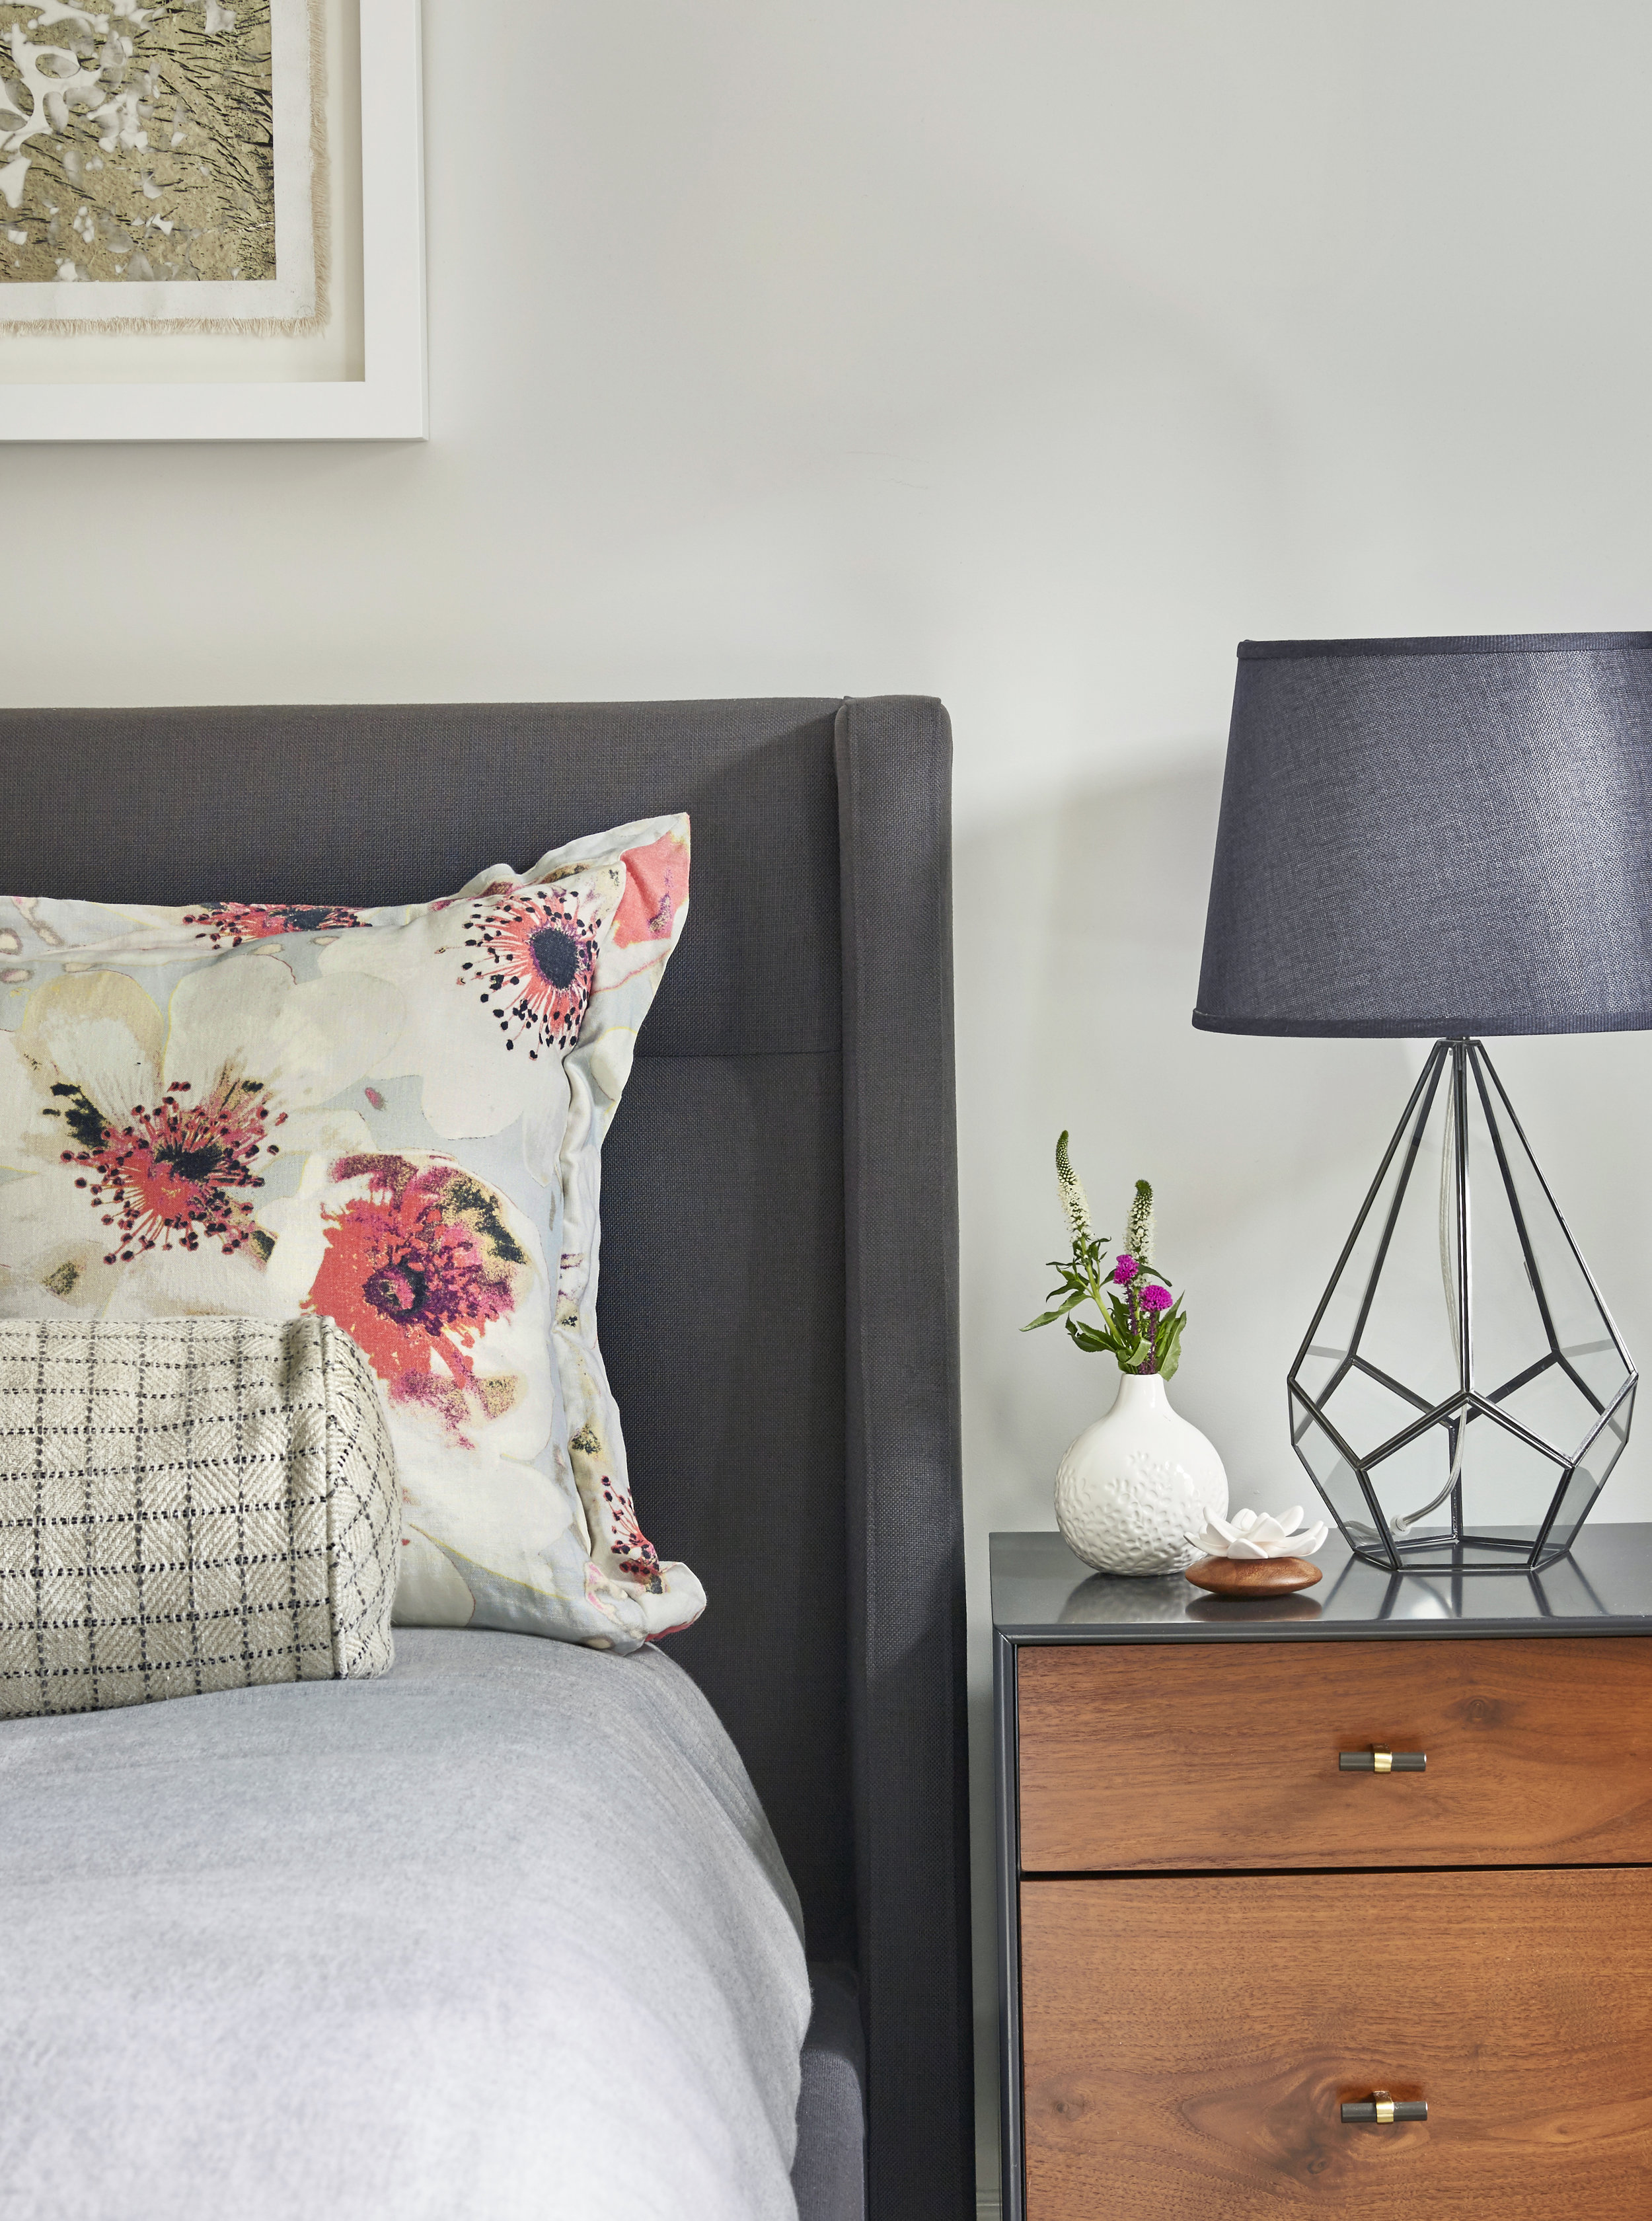 Master-Bedroom-Charcoal-Headboard-Floral-Pillow-Park-Slope-Jmorris-Design.jpg